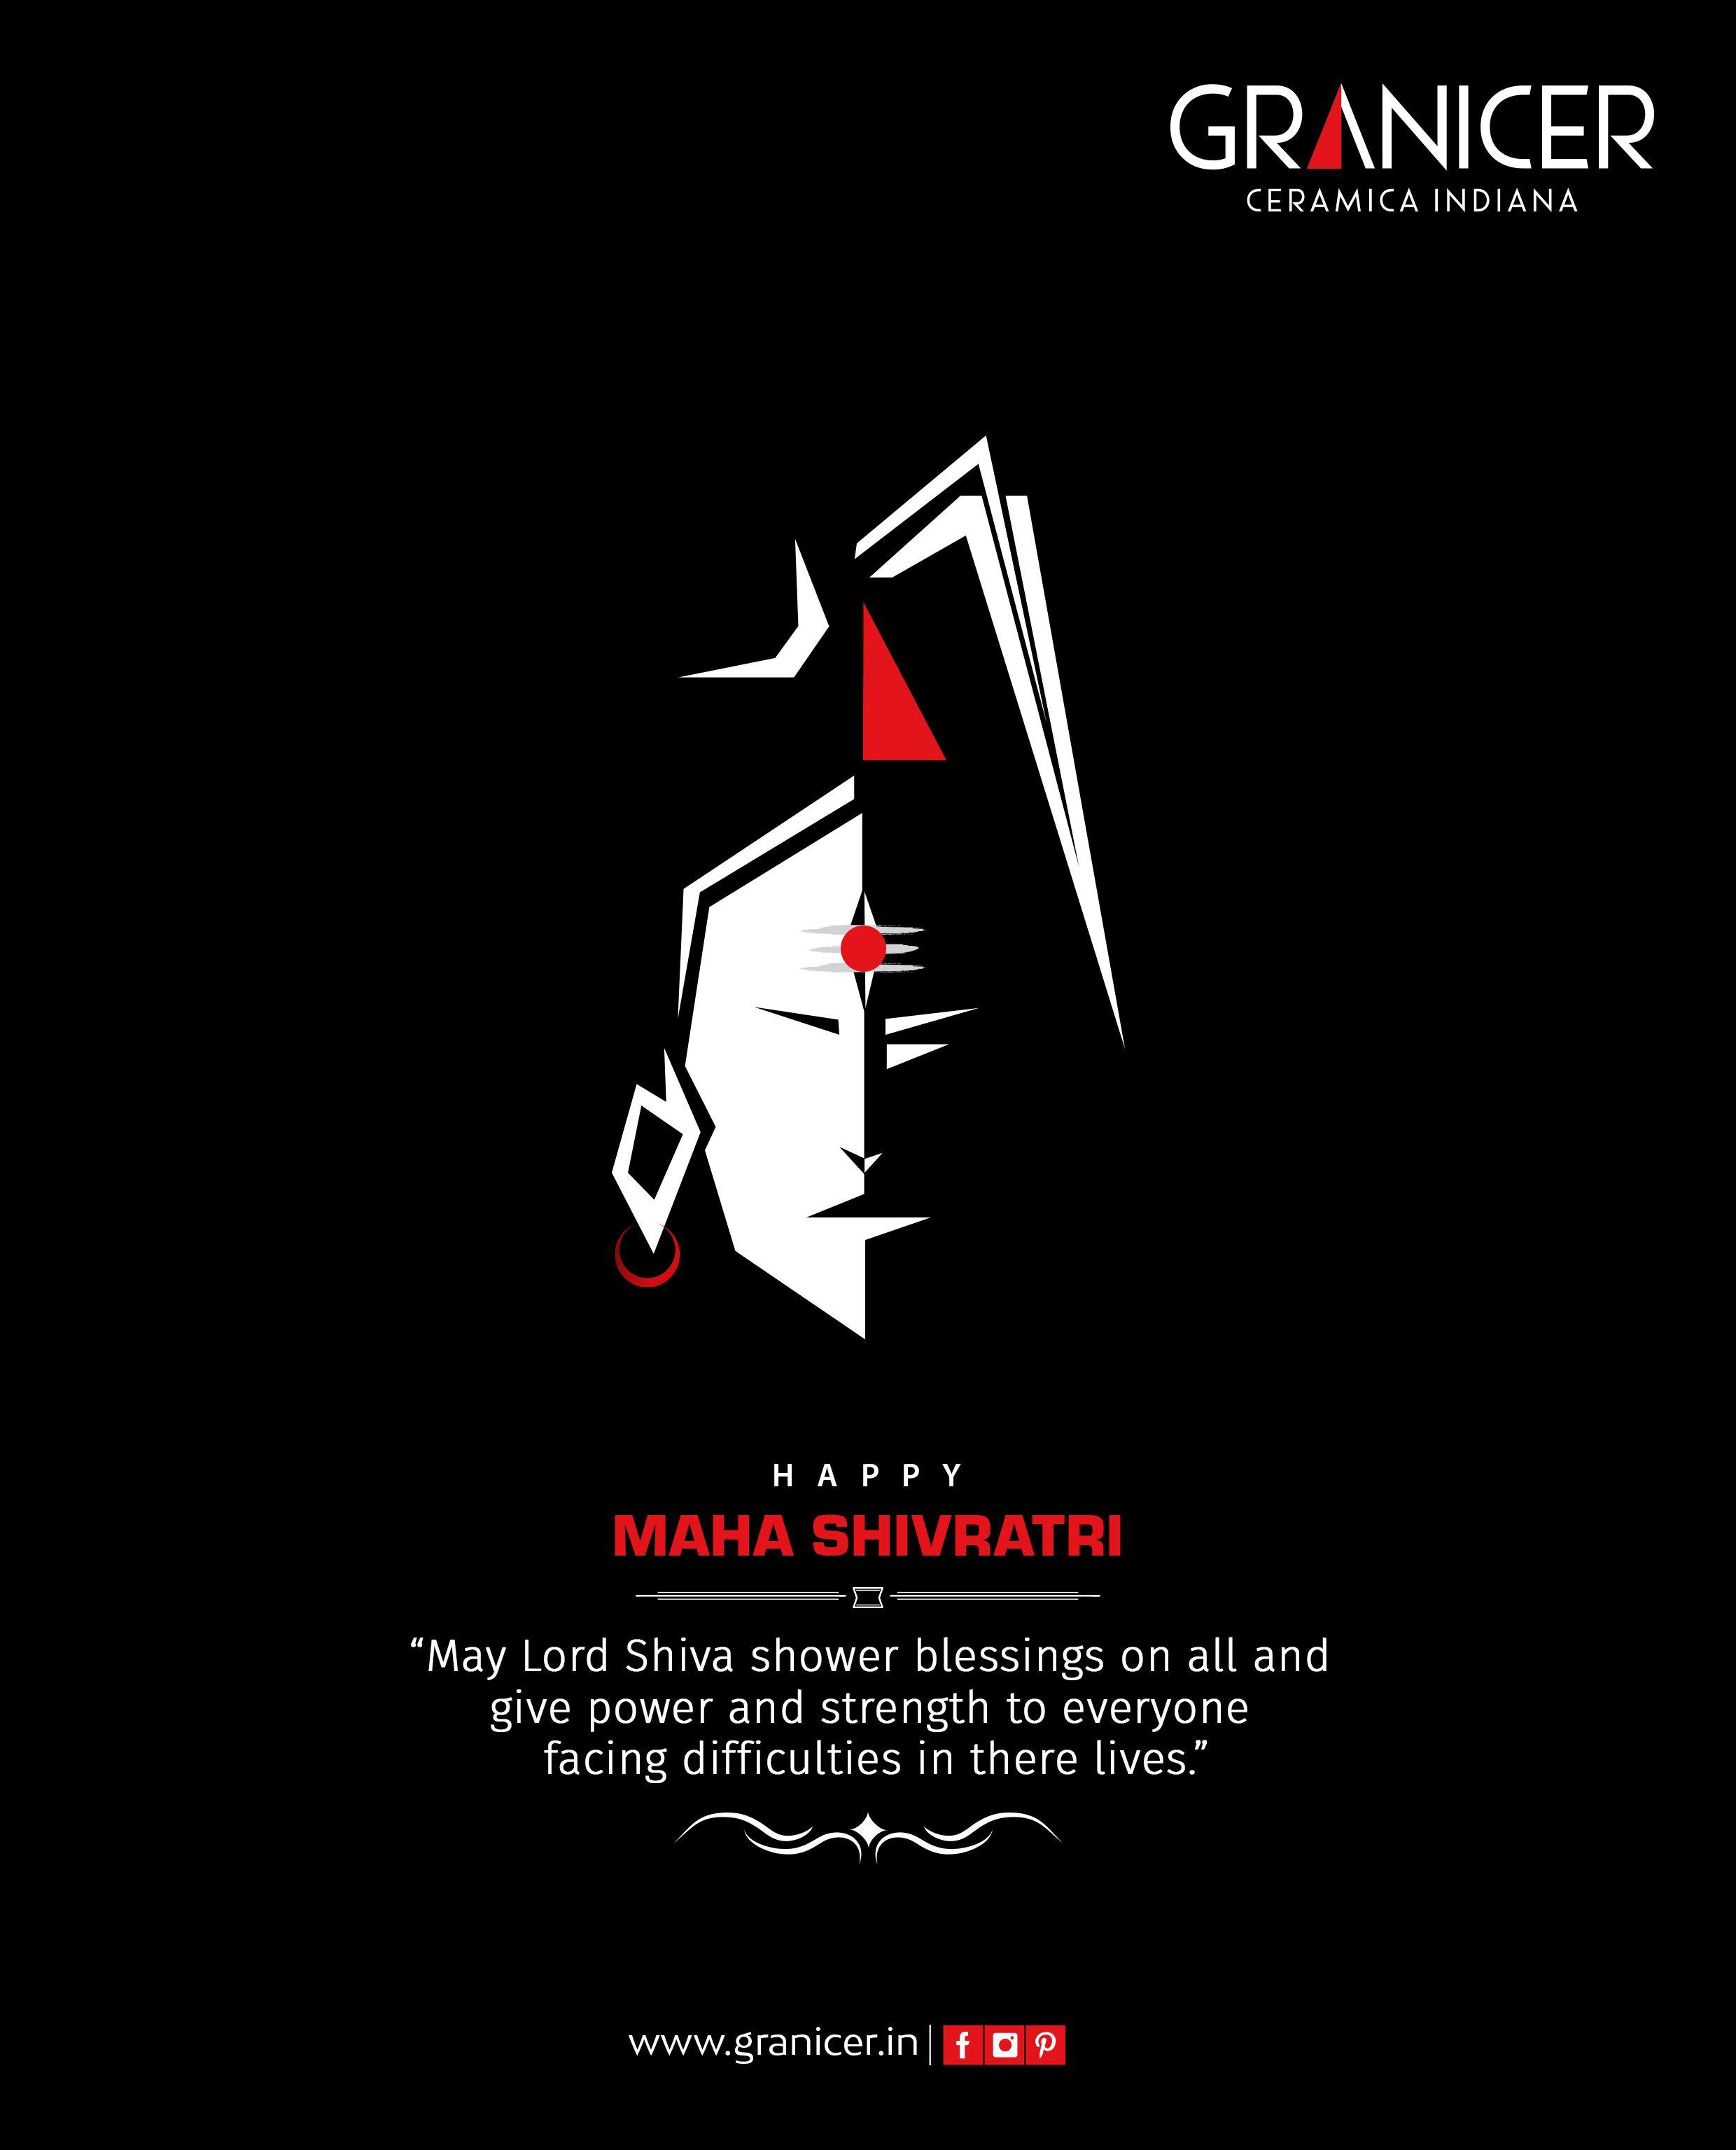 May Lord Shiva showers blessings on all and gives power and strength to everyone facing difficulties in there lives. 𝗛𝗮𝗽𝗽𝘆 𝗠𝗮𝗵𝗮 𝗦𝗵𝗶𝘃𝗿𝗮𝘁𝗿𝗶  #shivratri #mahadev #himachal  #bholenath #shiva #harharmahadev #mahakal #bhavnath #girnari #shiv #Granicerceramicaindian #tile #naturalsurface #ceramic #innovation #gvt #tiles